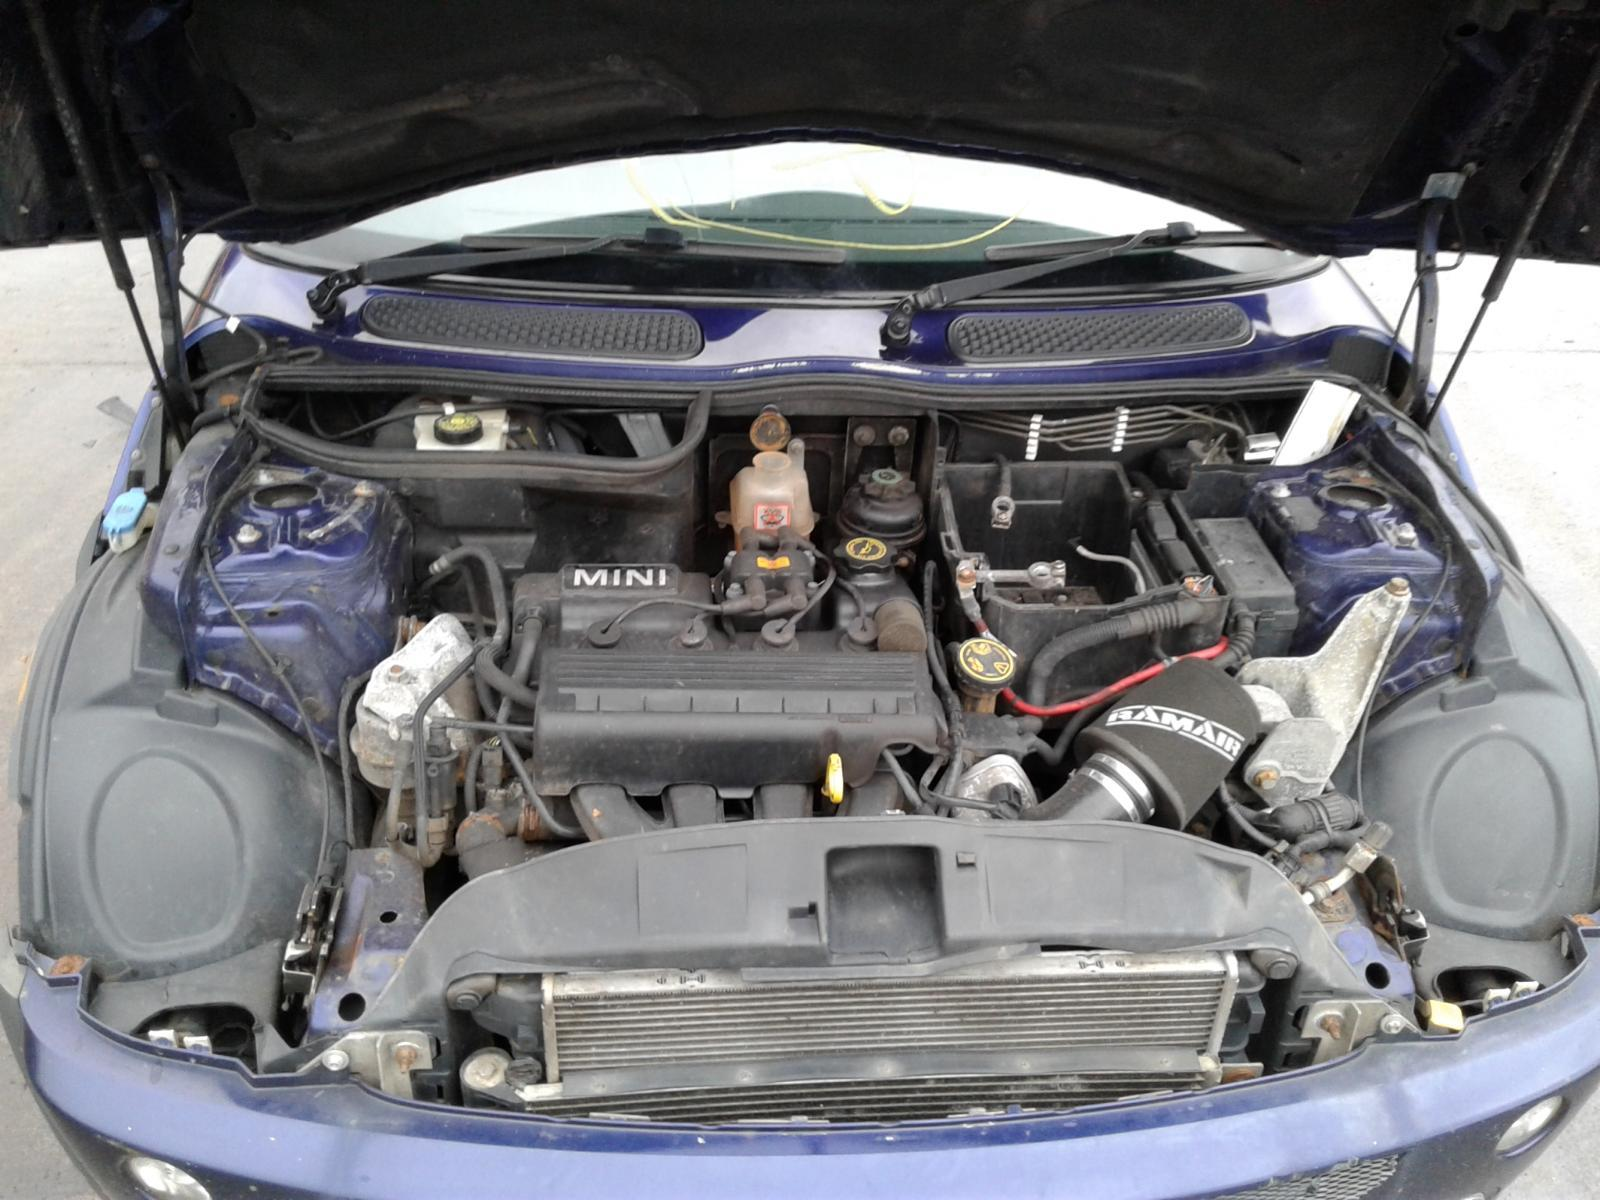 2005 MINI ONE Image